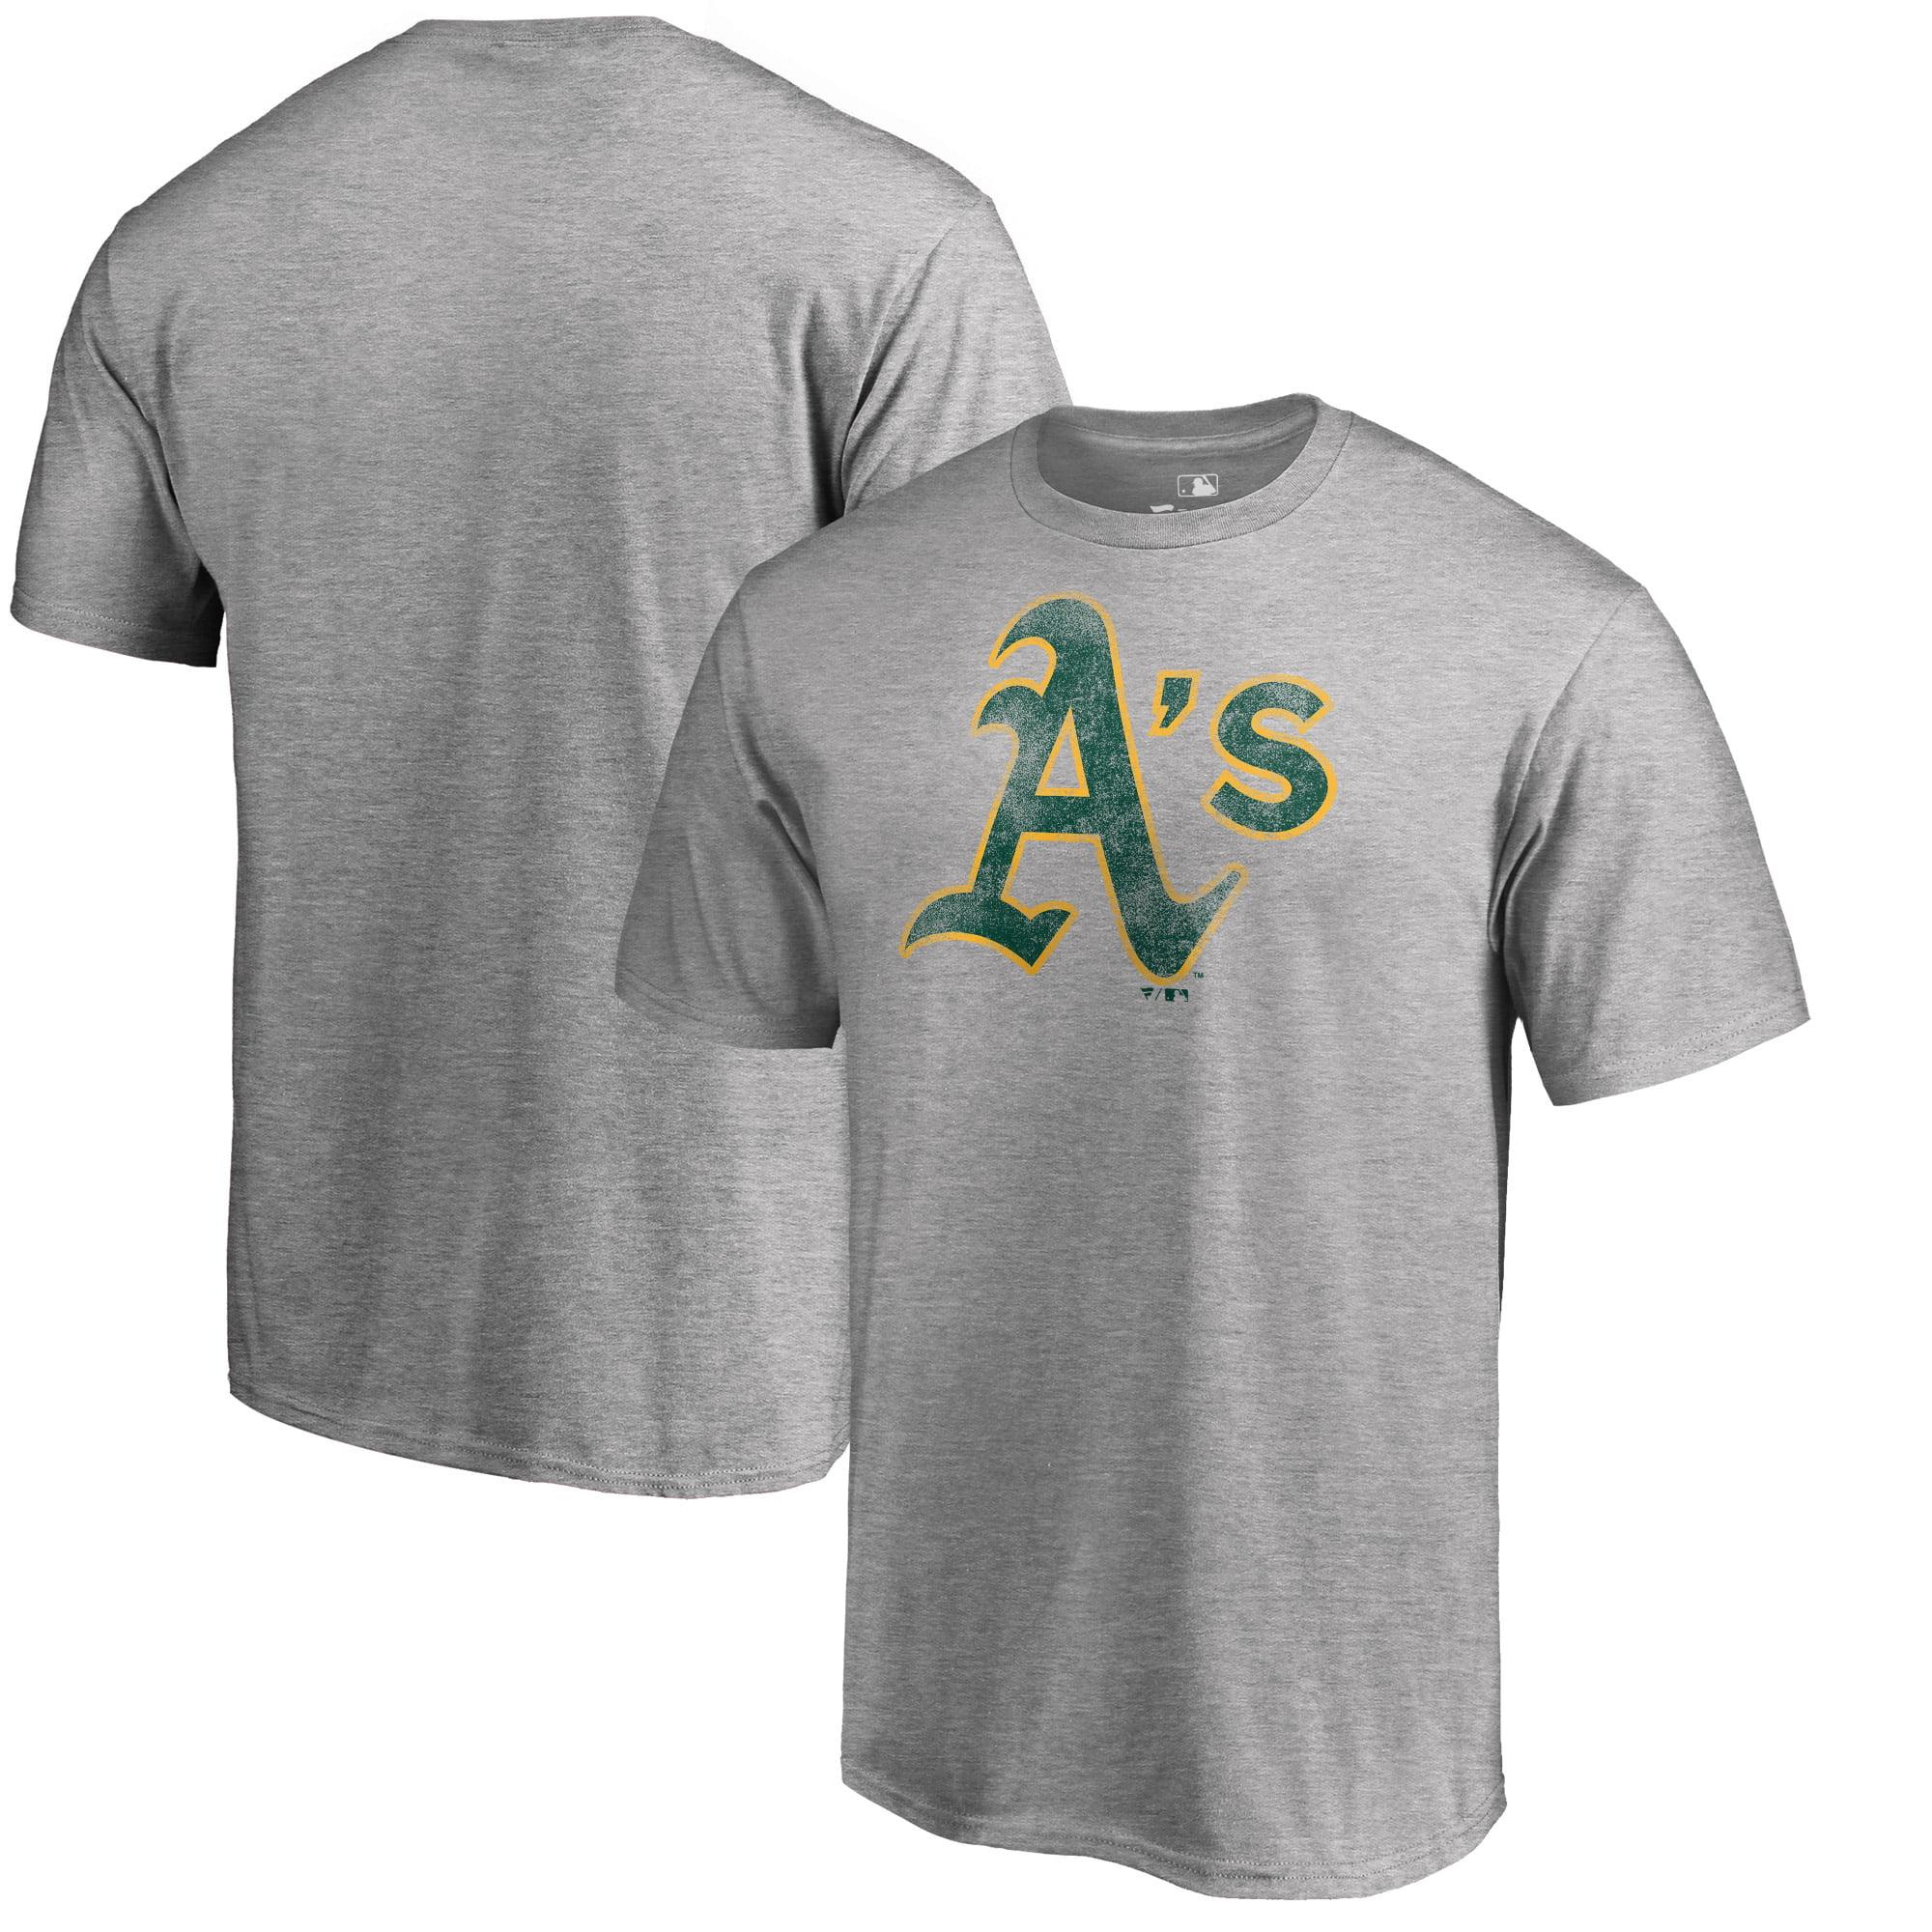 Oakland Athletics Fanatics Branded Big & Tall Distressed Team T-Shirt - Heathered Gray